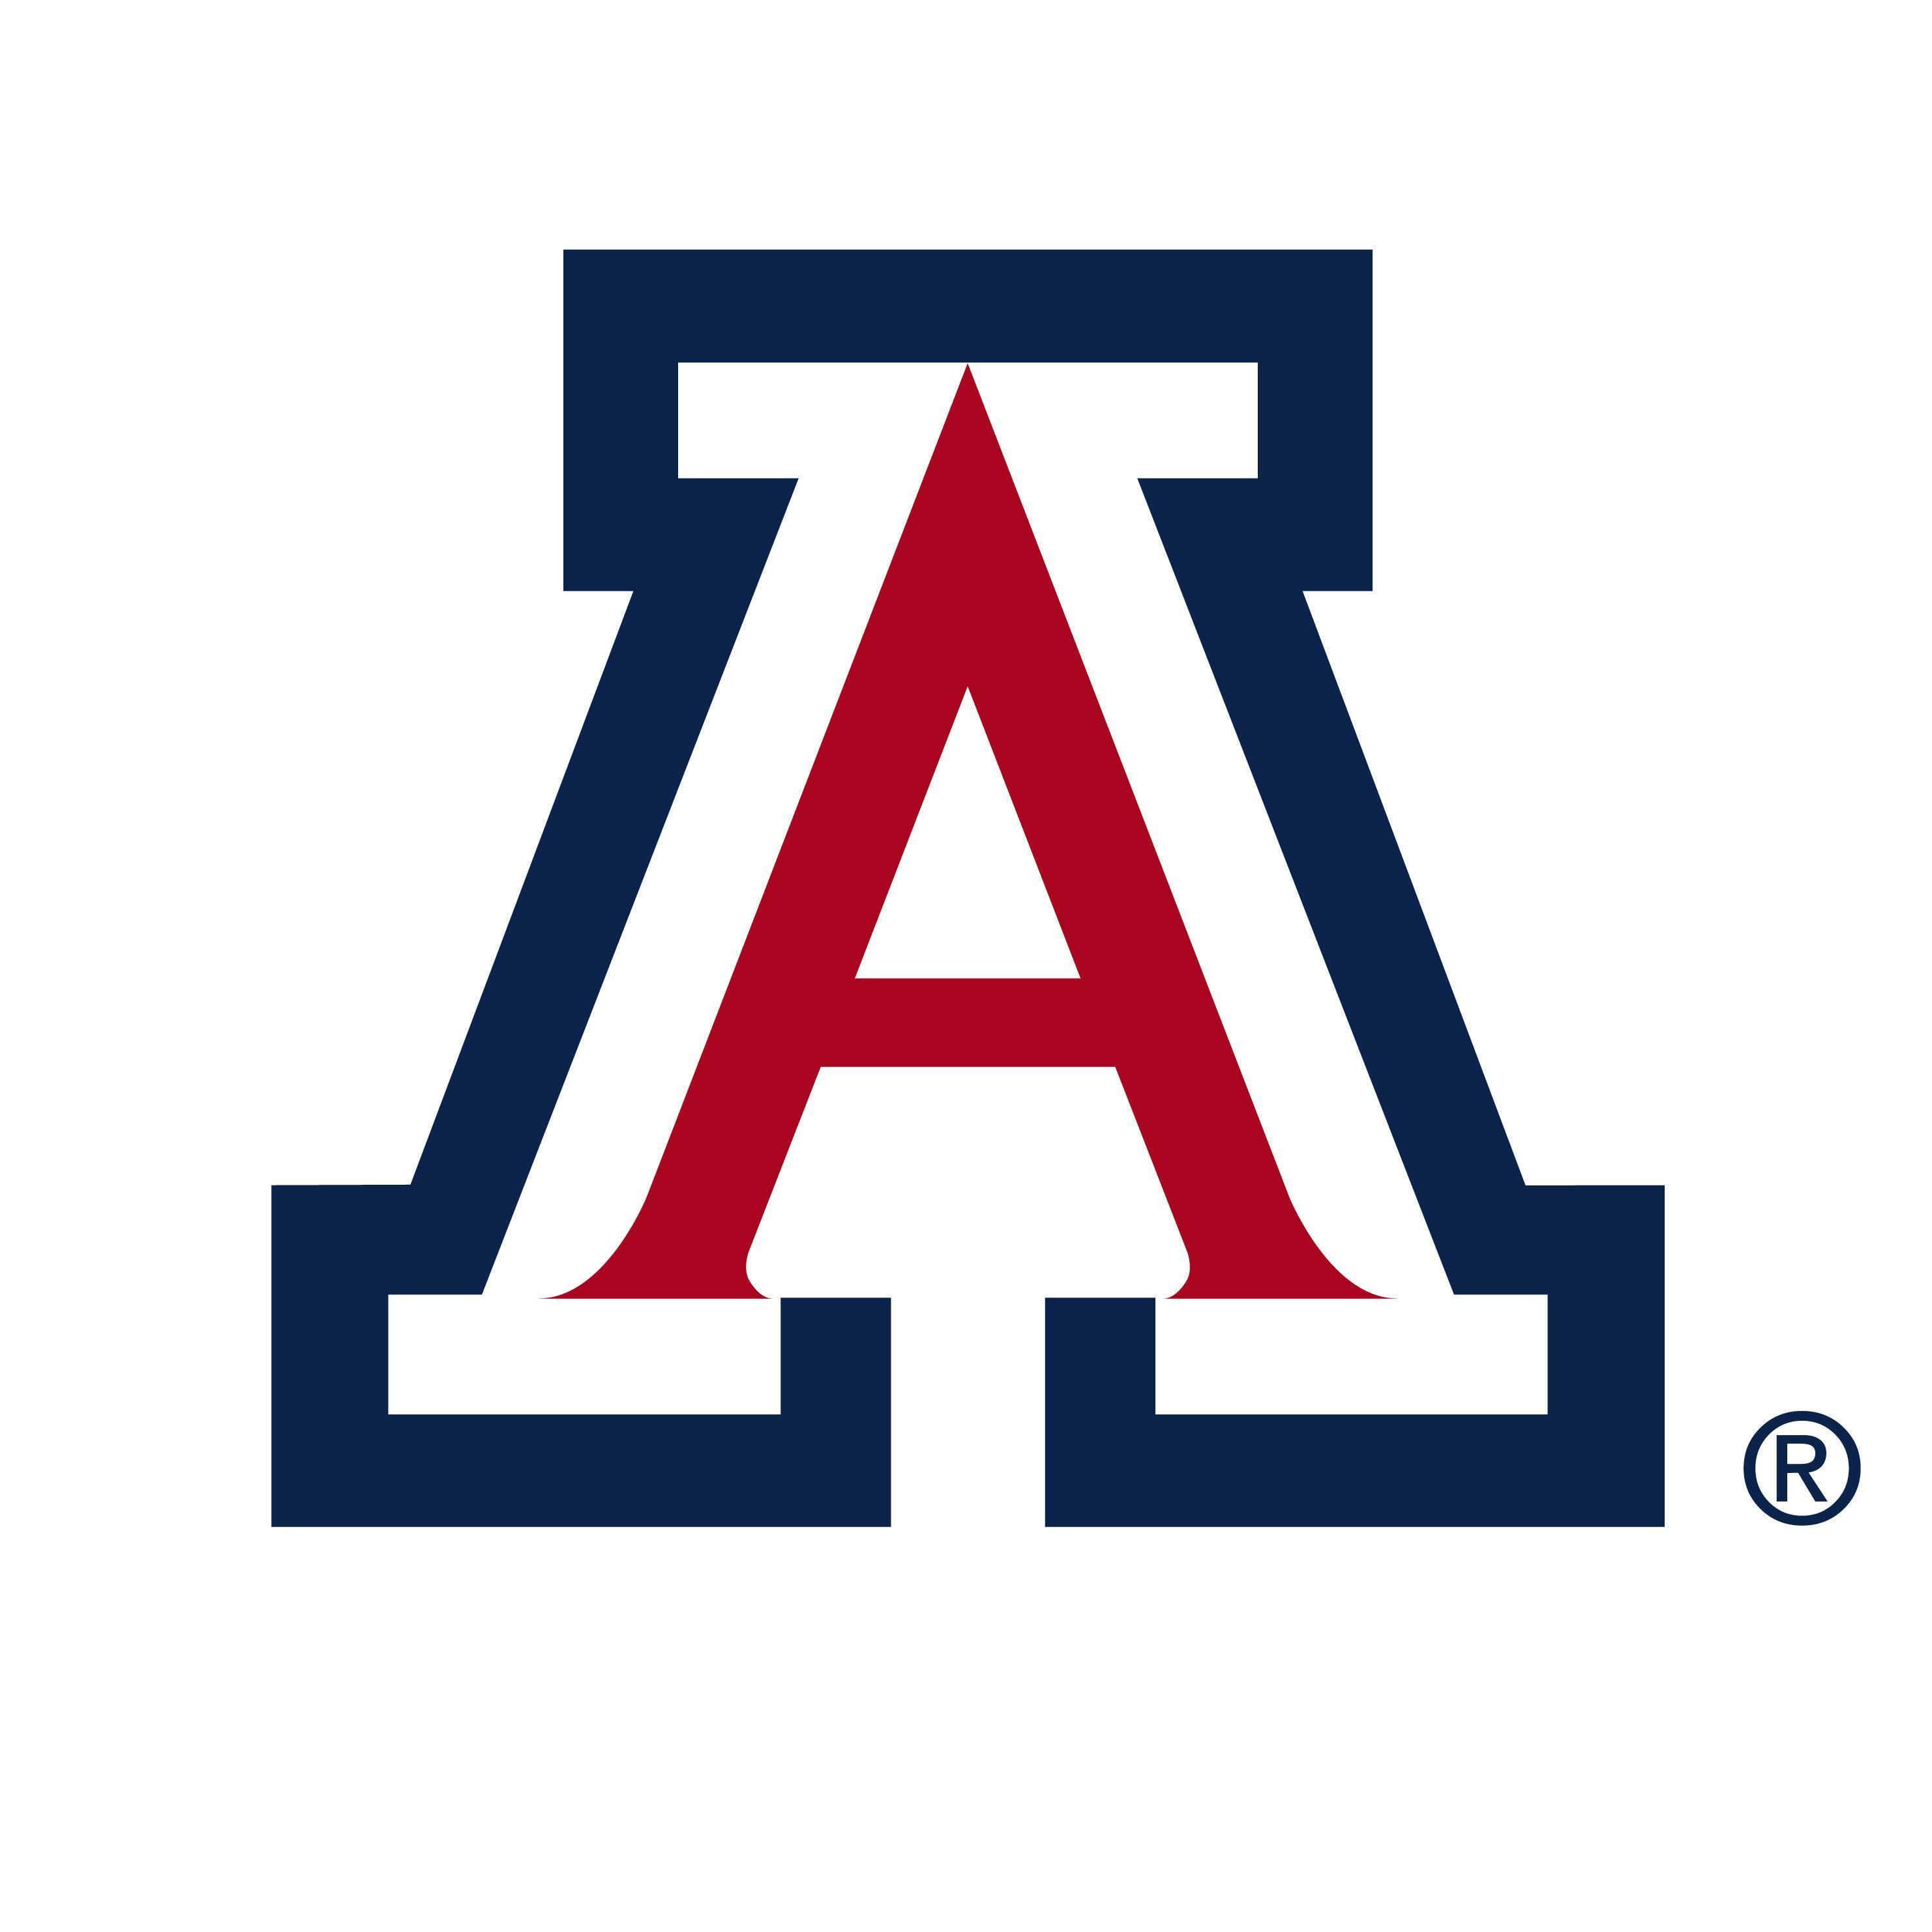 Arizona_logo_R.jpeg